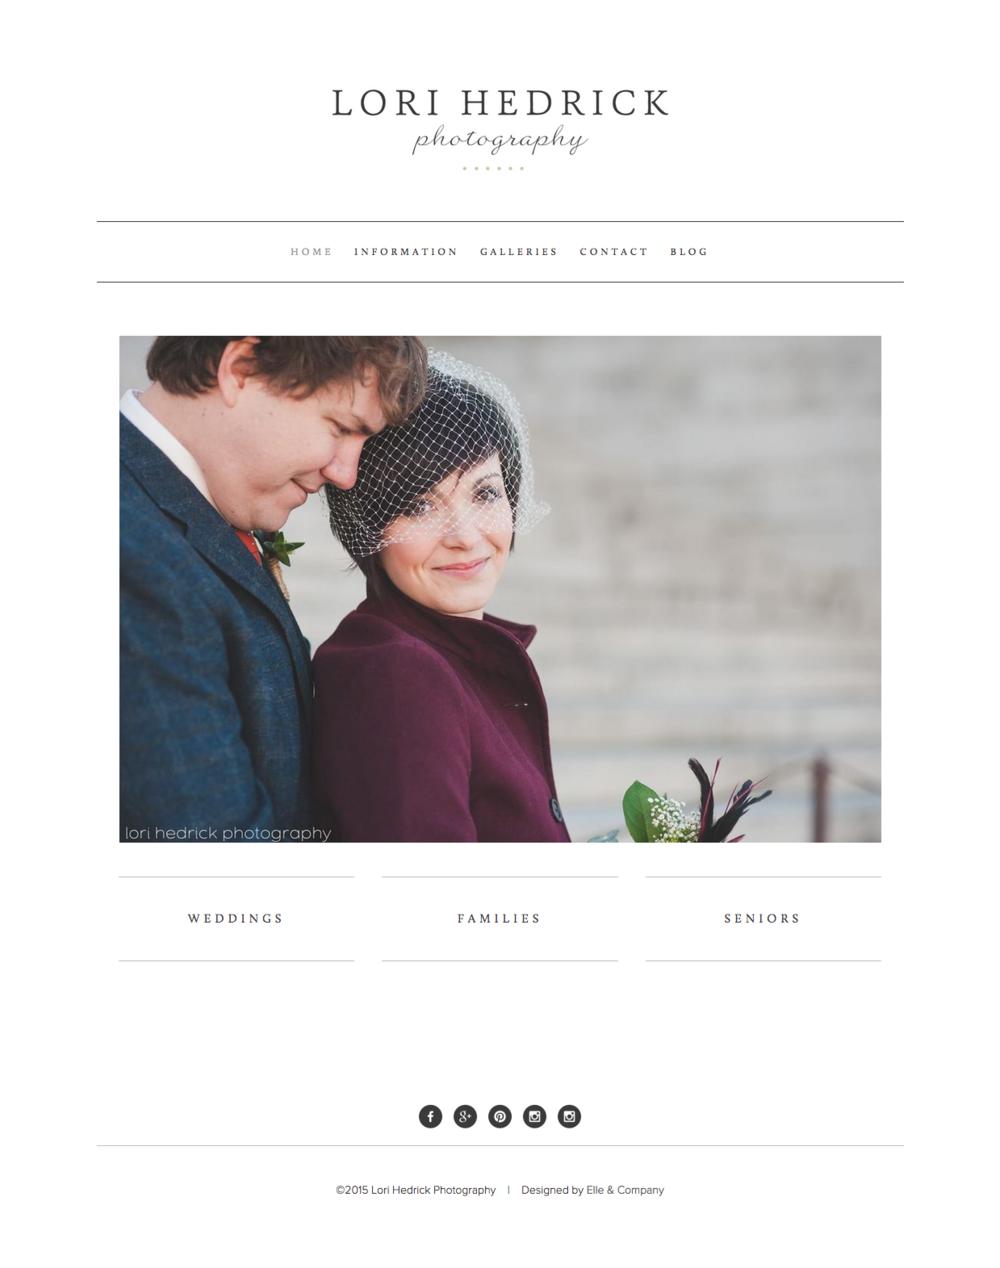 Website design for Lori Hedrick Photography - Elle & Company